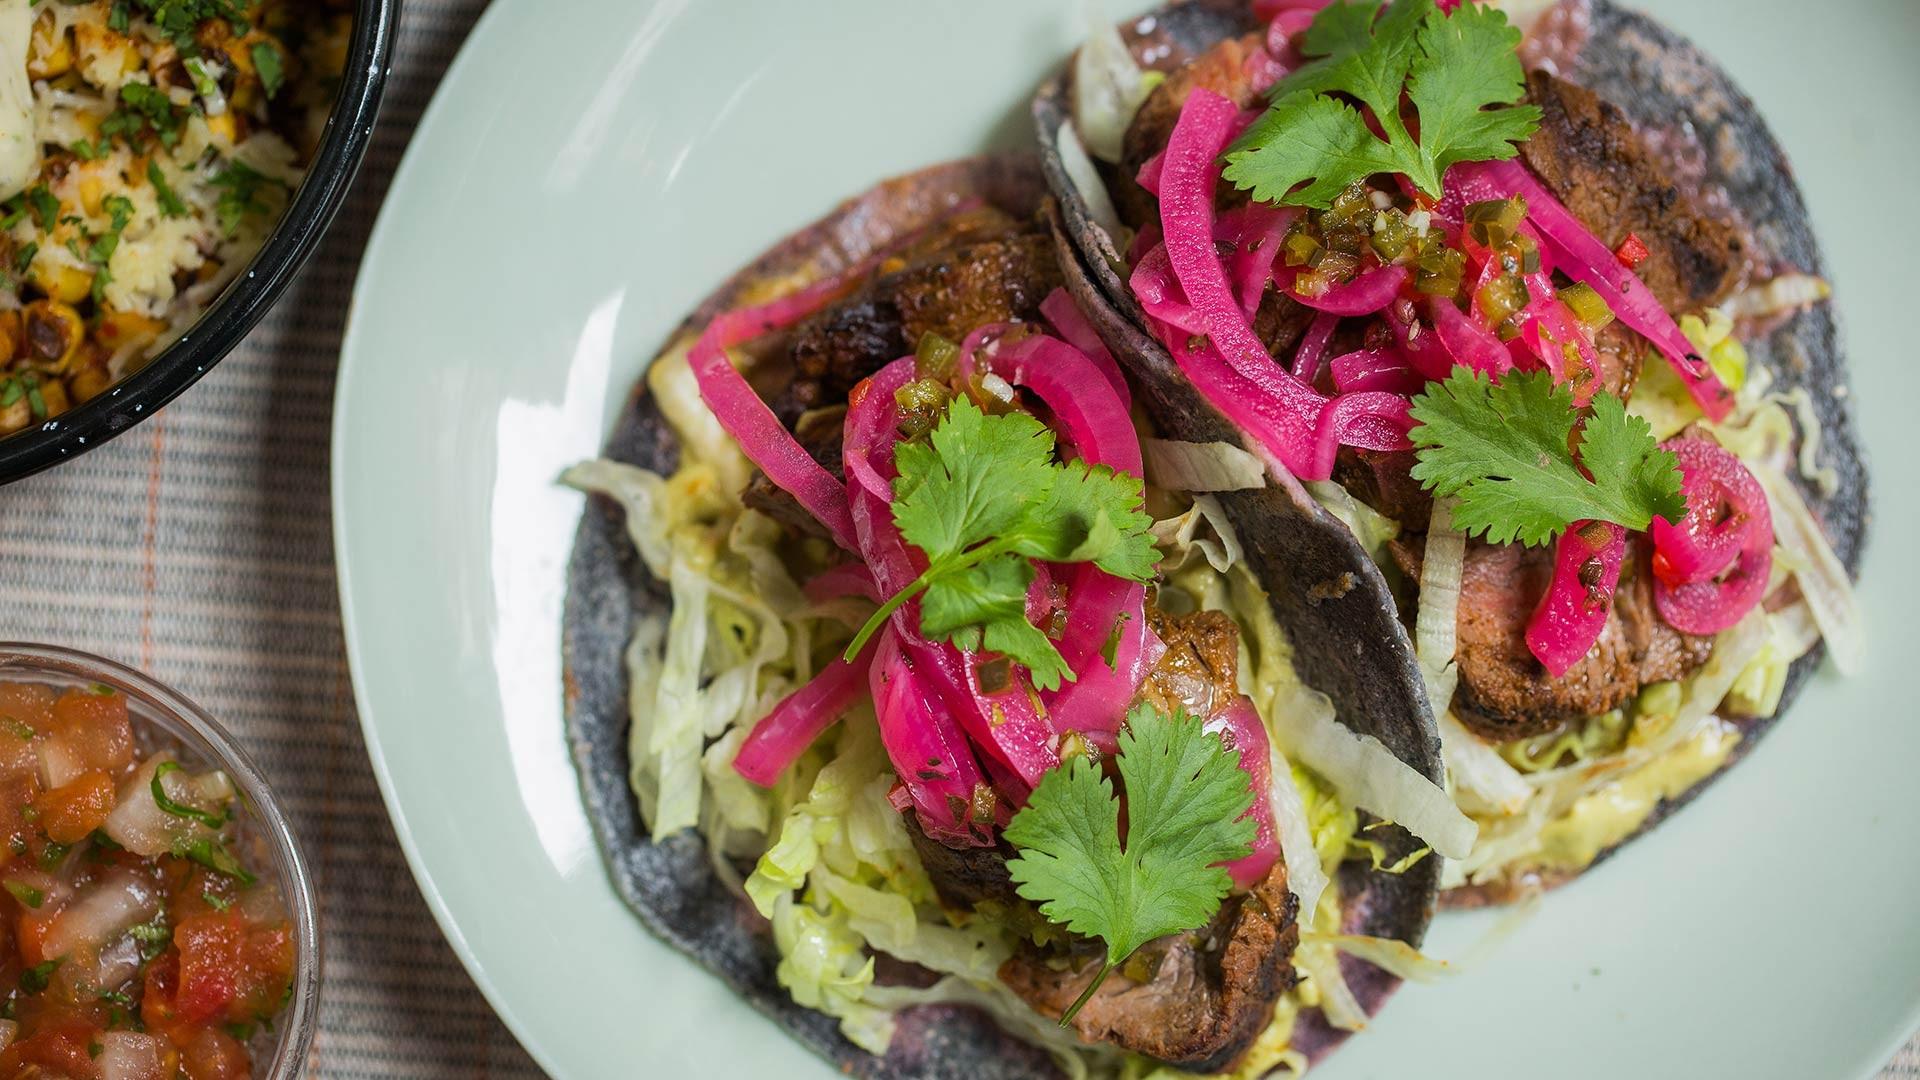 The carne asado taco